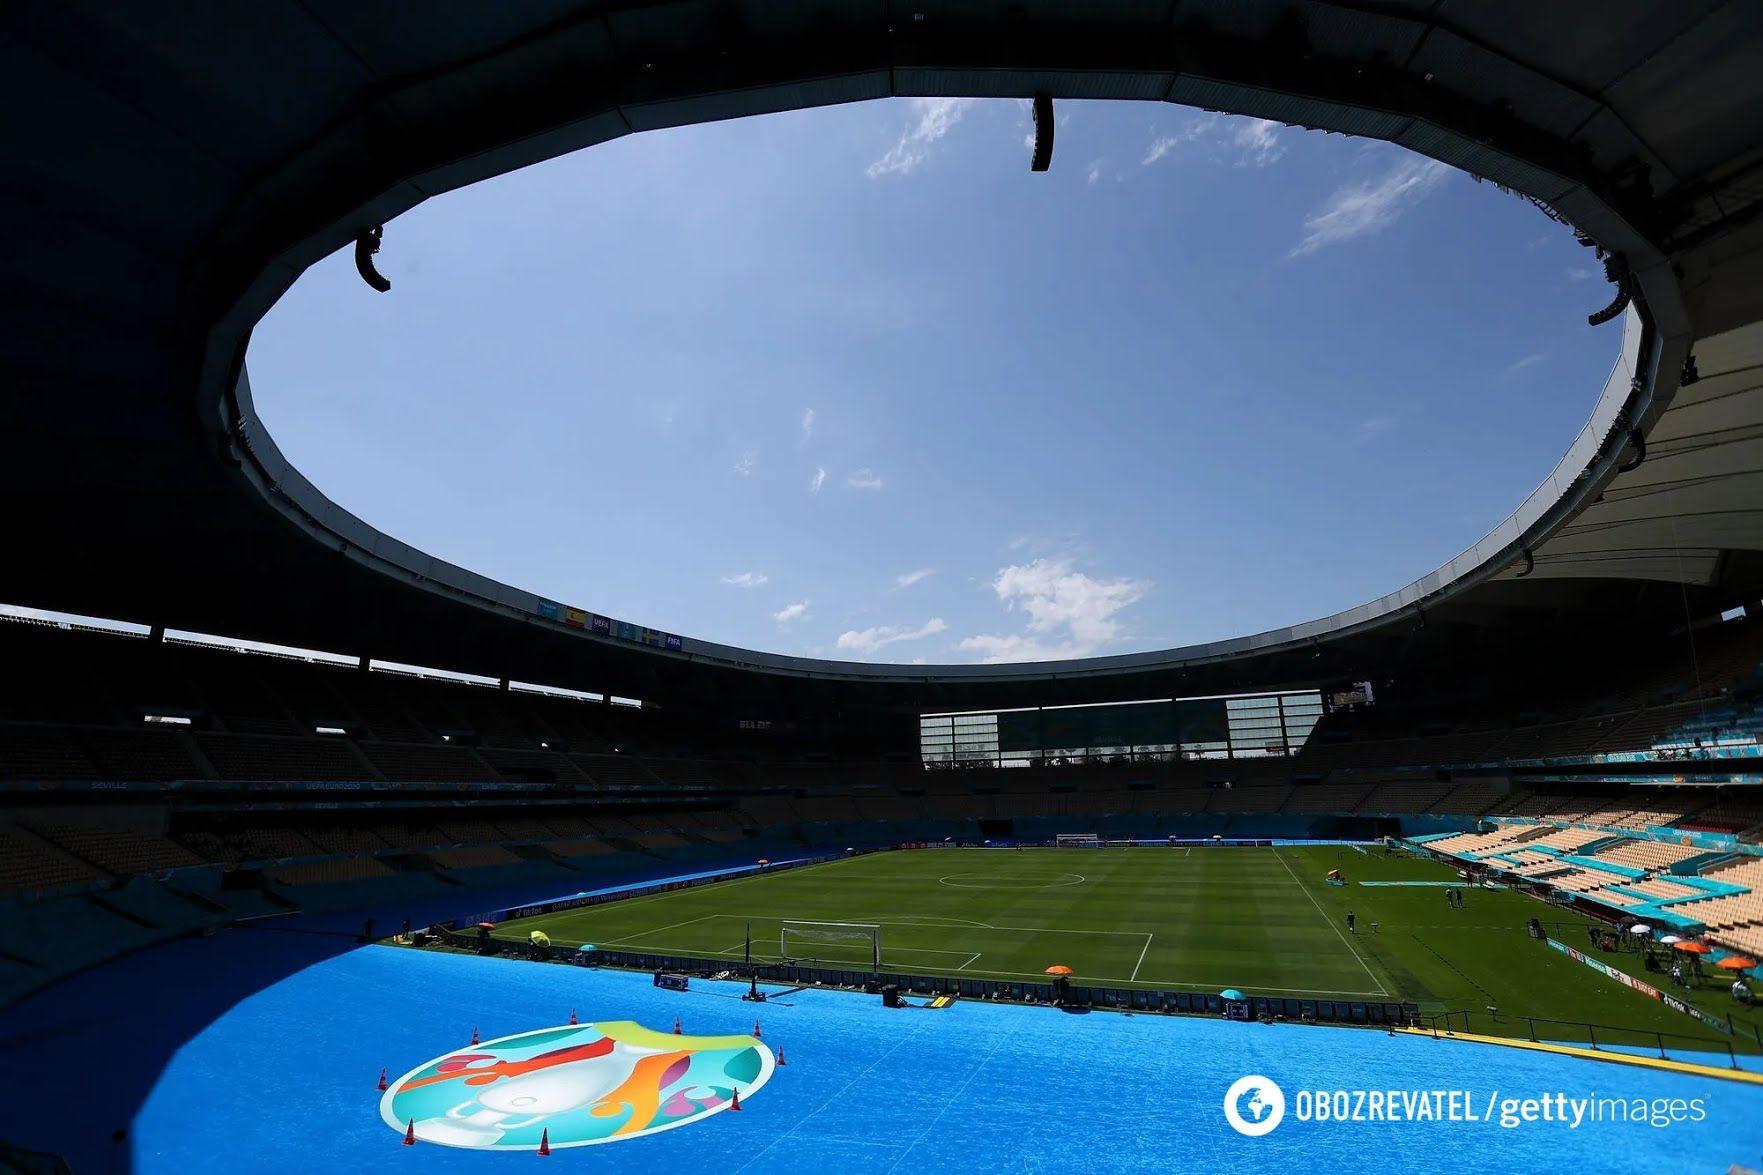 Олимпийский стадион в Севилье.